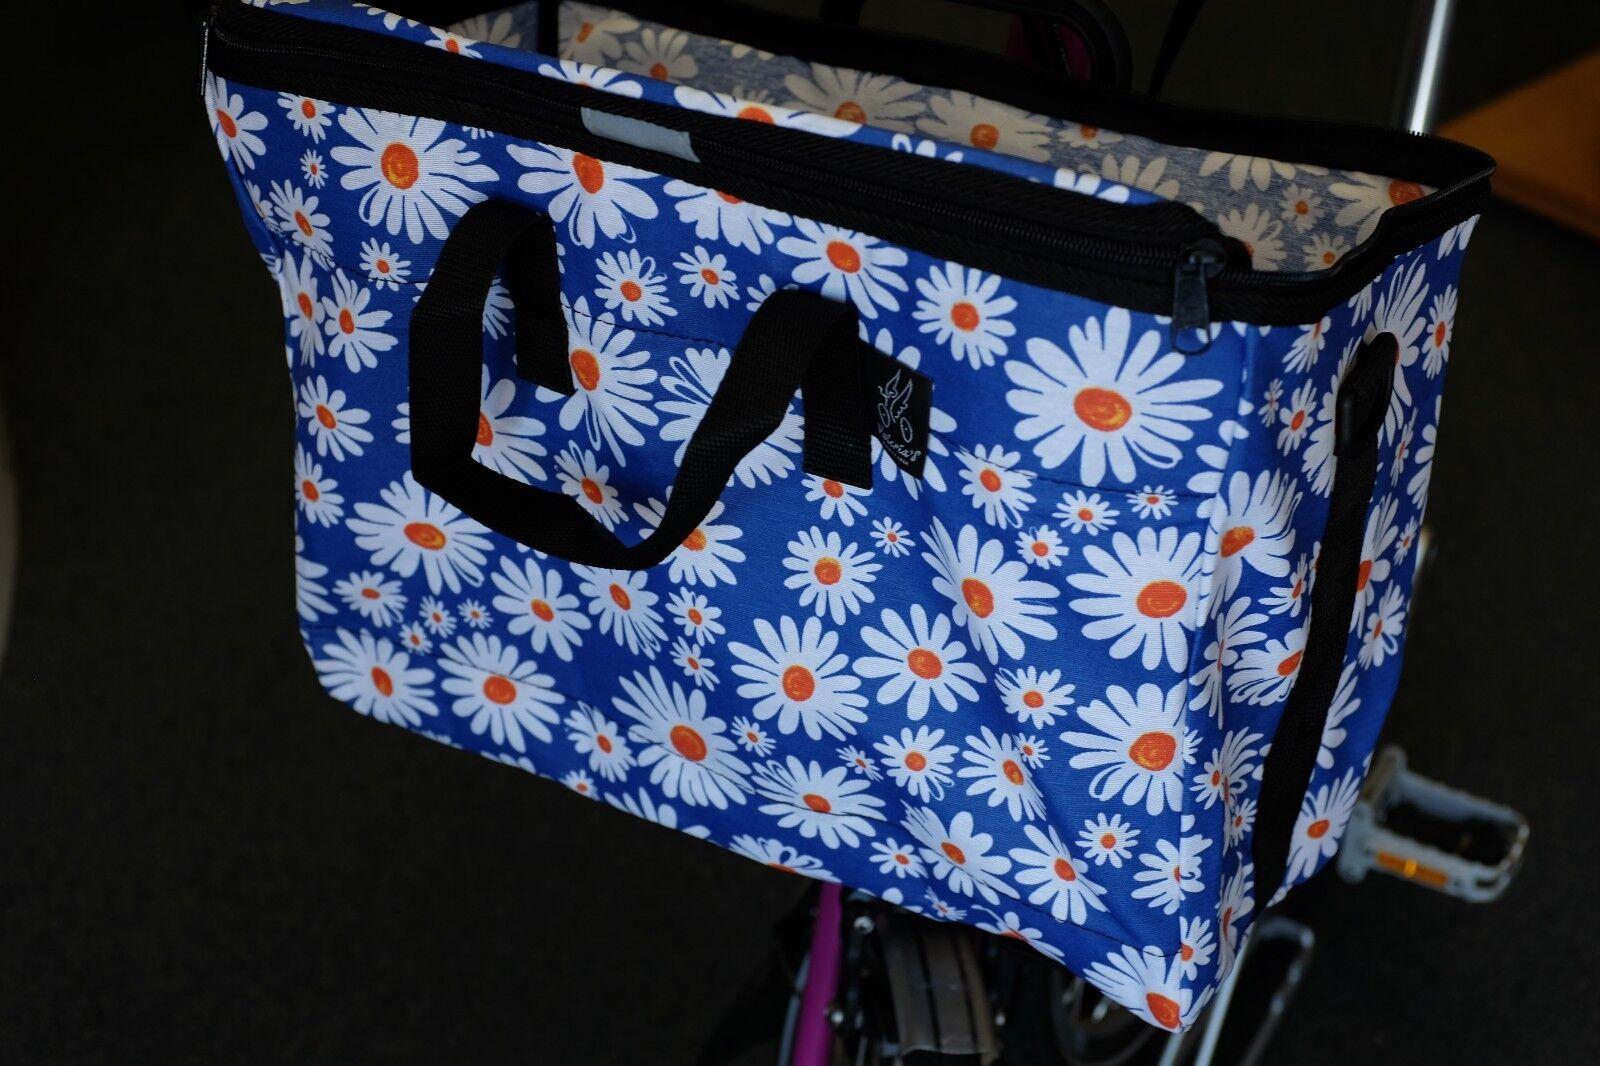 Brompton Faltrad Front Basket, Verbessertes Design - Daisy